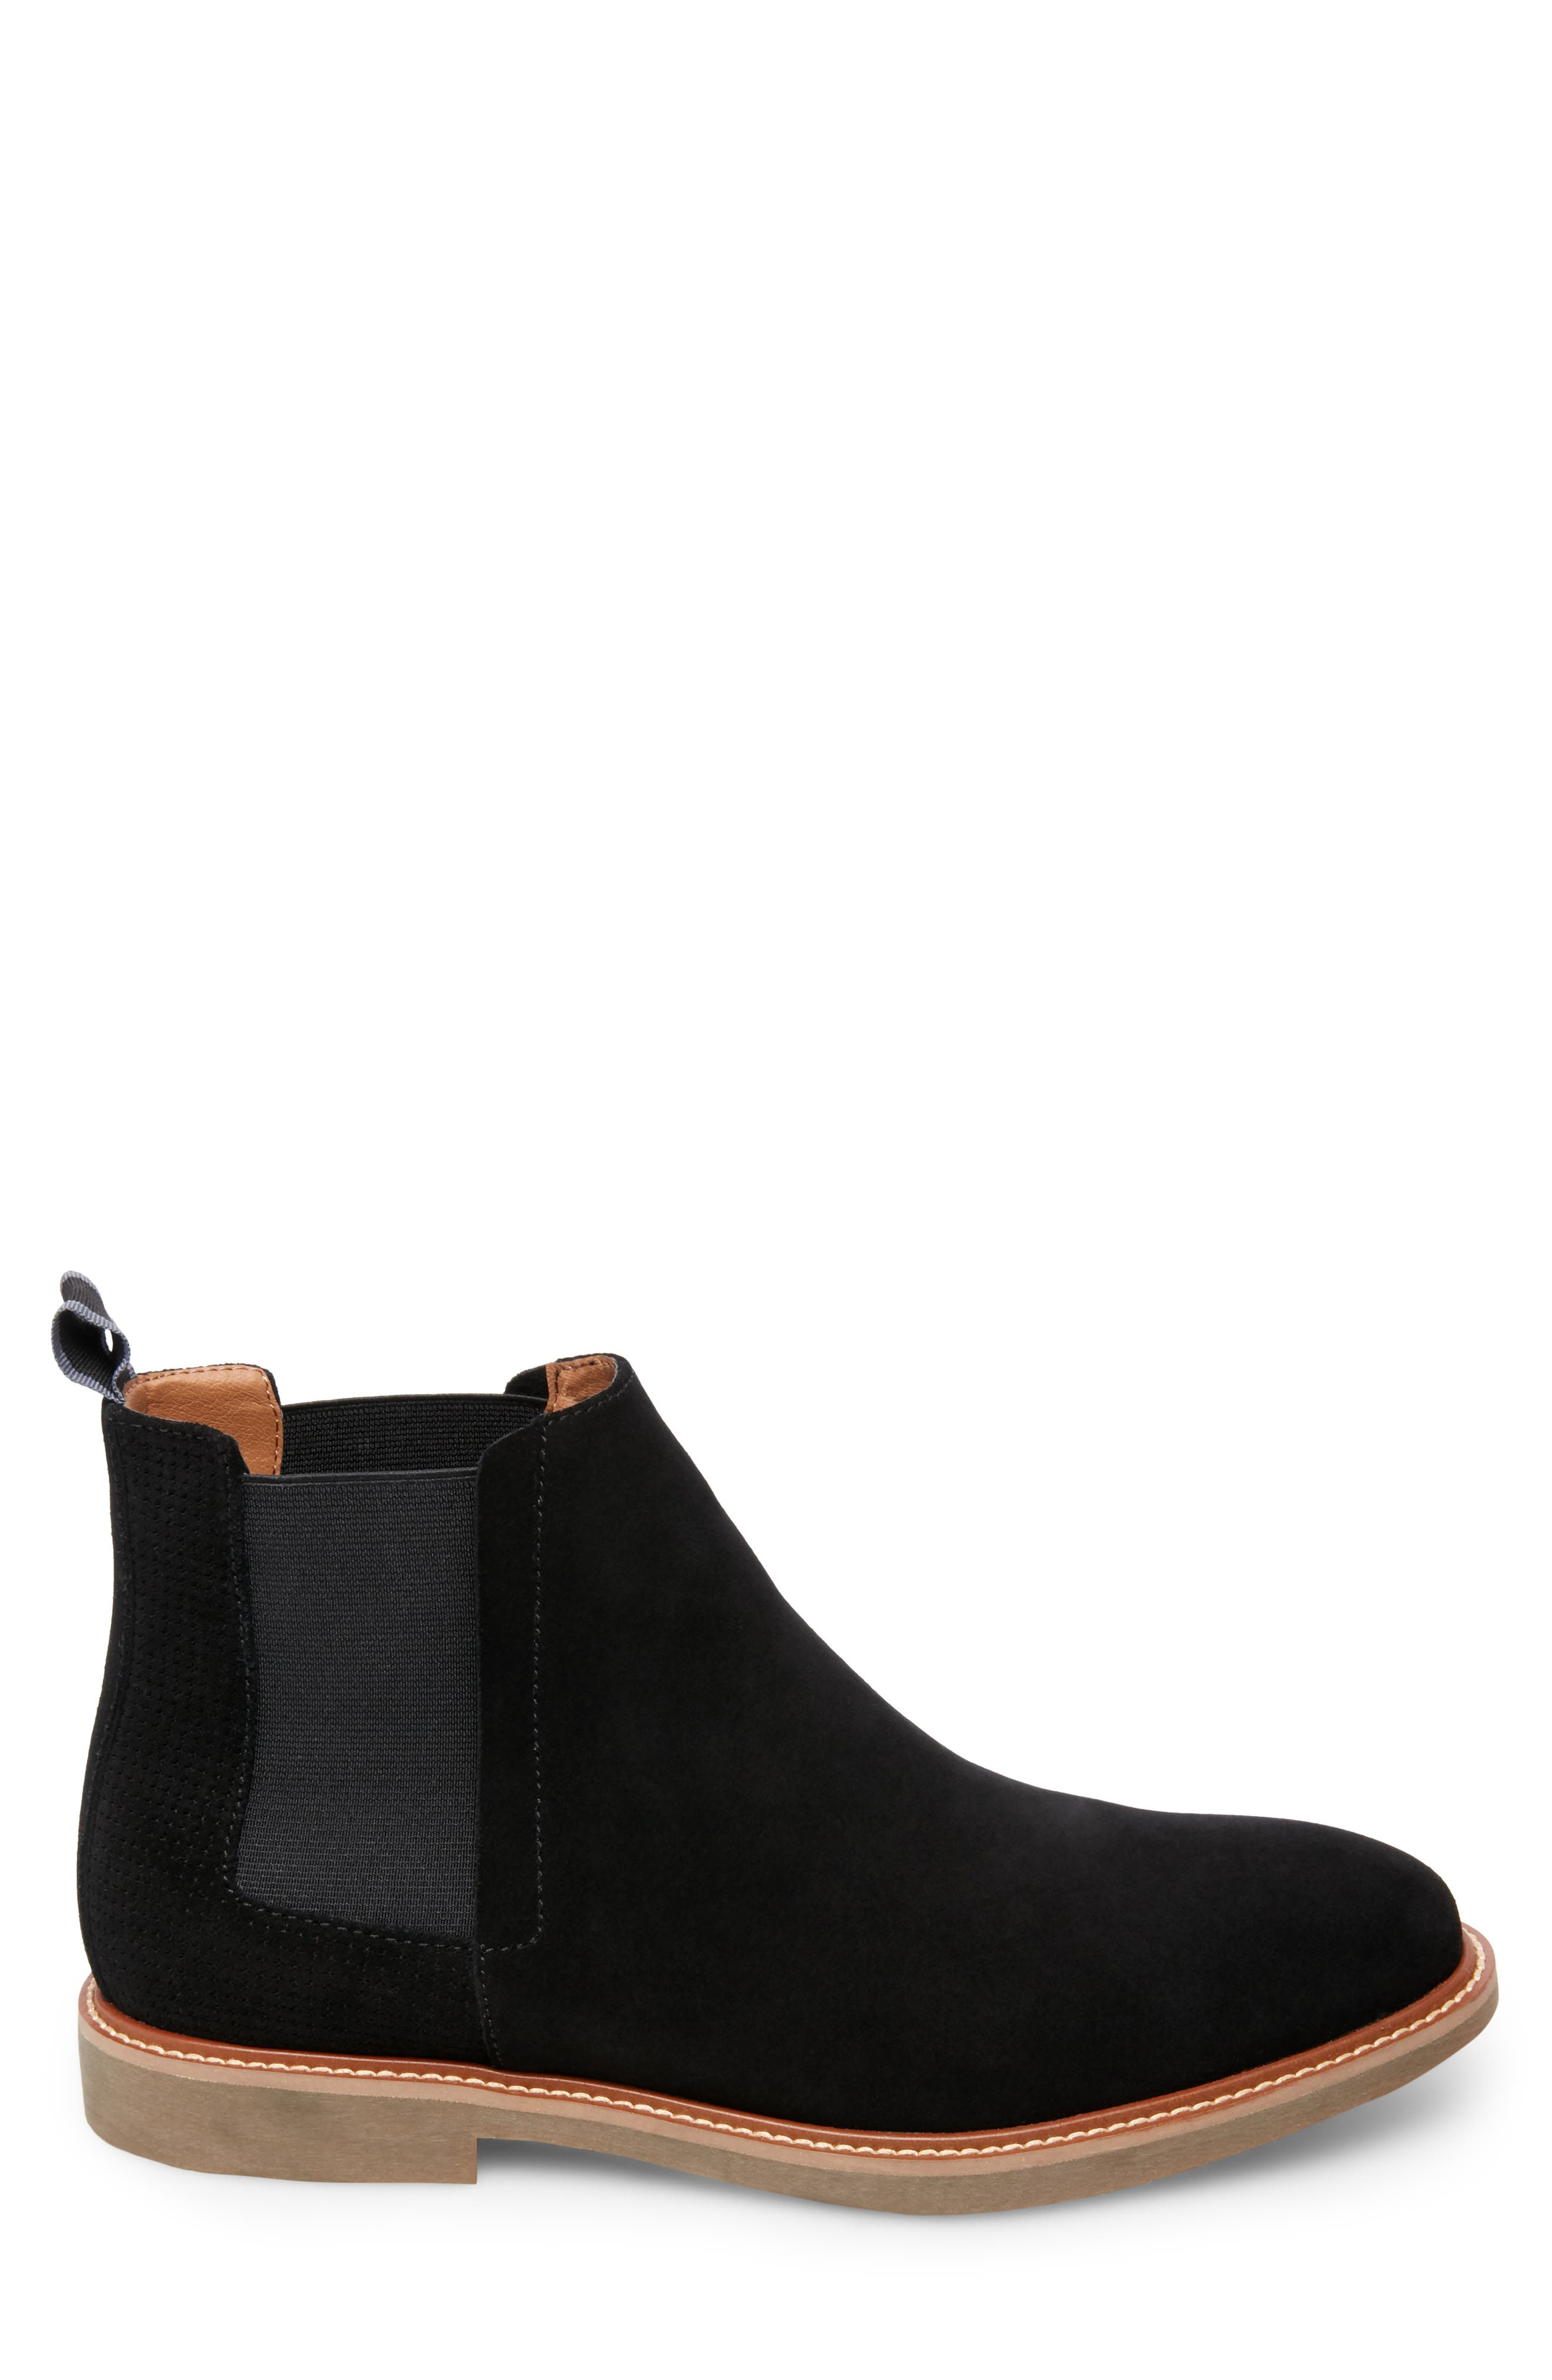 STEVE MADDEN, Highlyte Textured Chelsea Boot, Alternate thumbnail 3, color, BLACK SUEDE